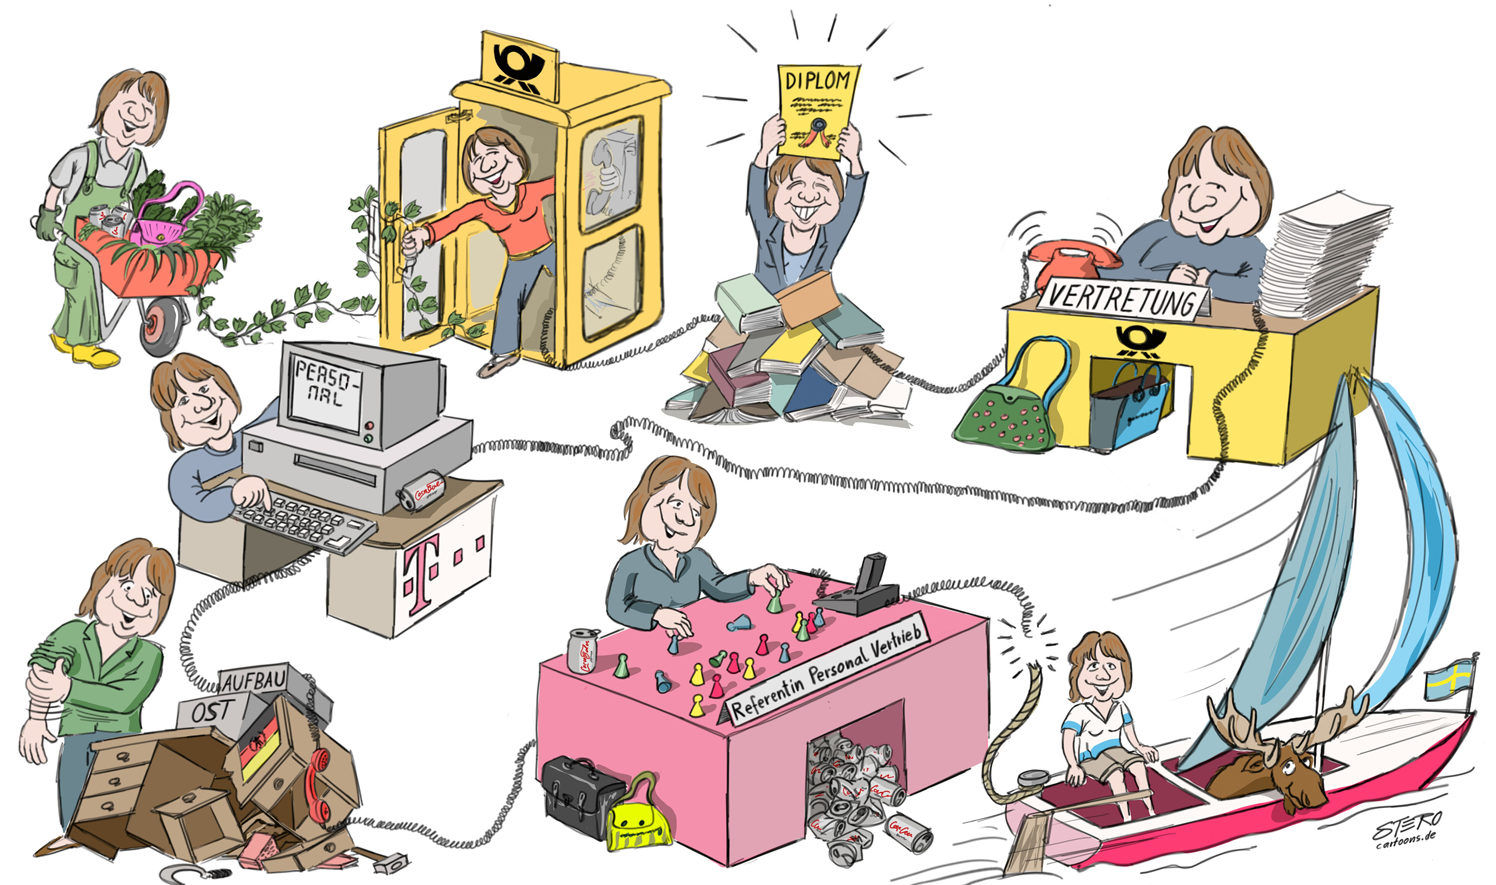 CArtoon-Comic-berufliche Laufbahn-Wimmelbild